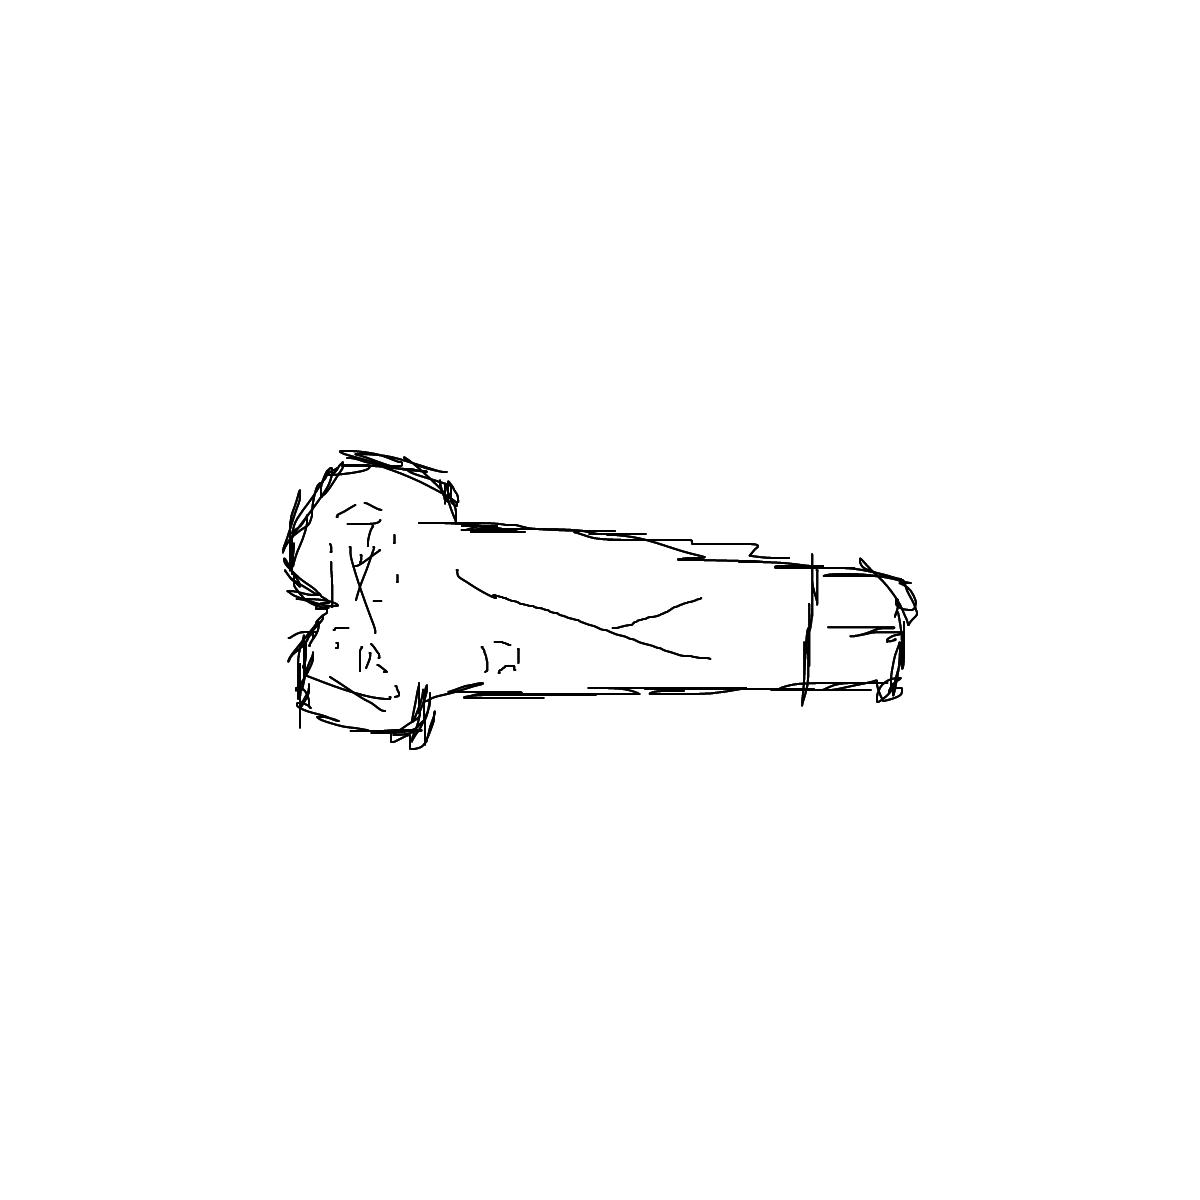 BAAAM drawing#15898 lat:41.6783370971679700lng: -0.8861861228942871